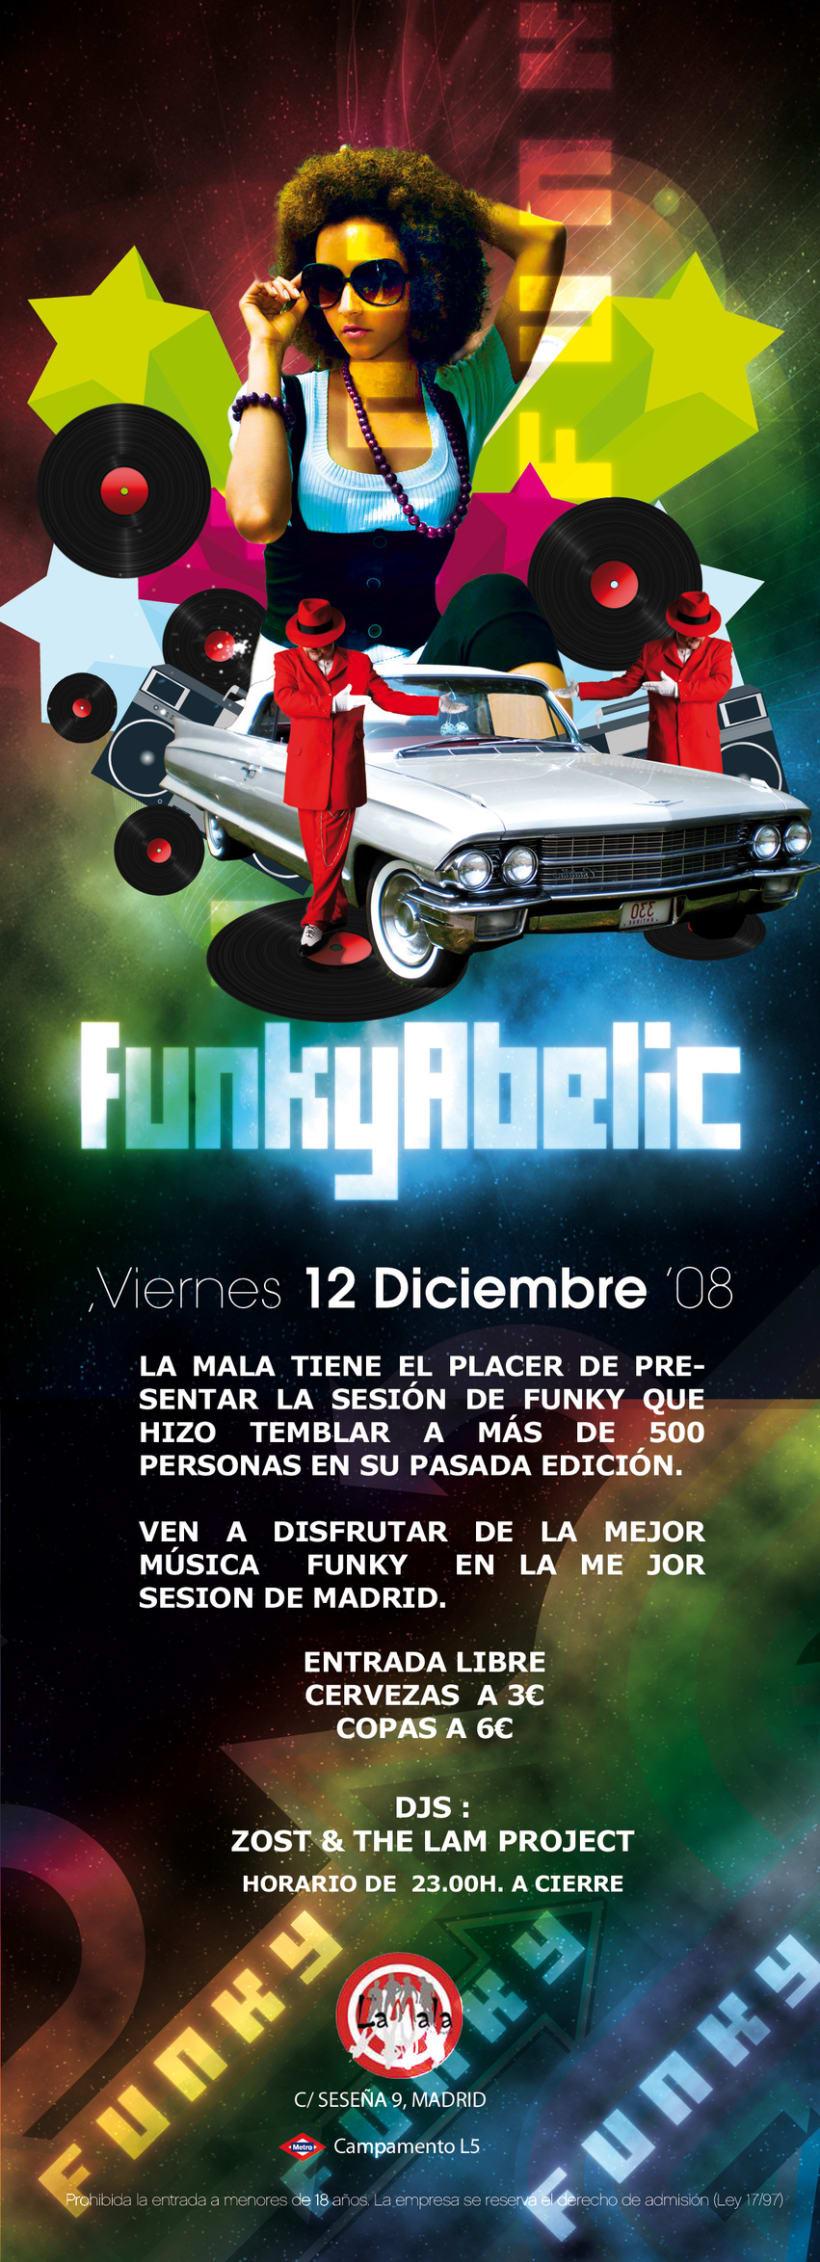 Funkyabelic @ La Mala 1